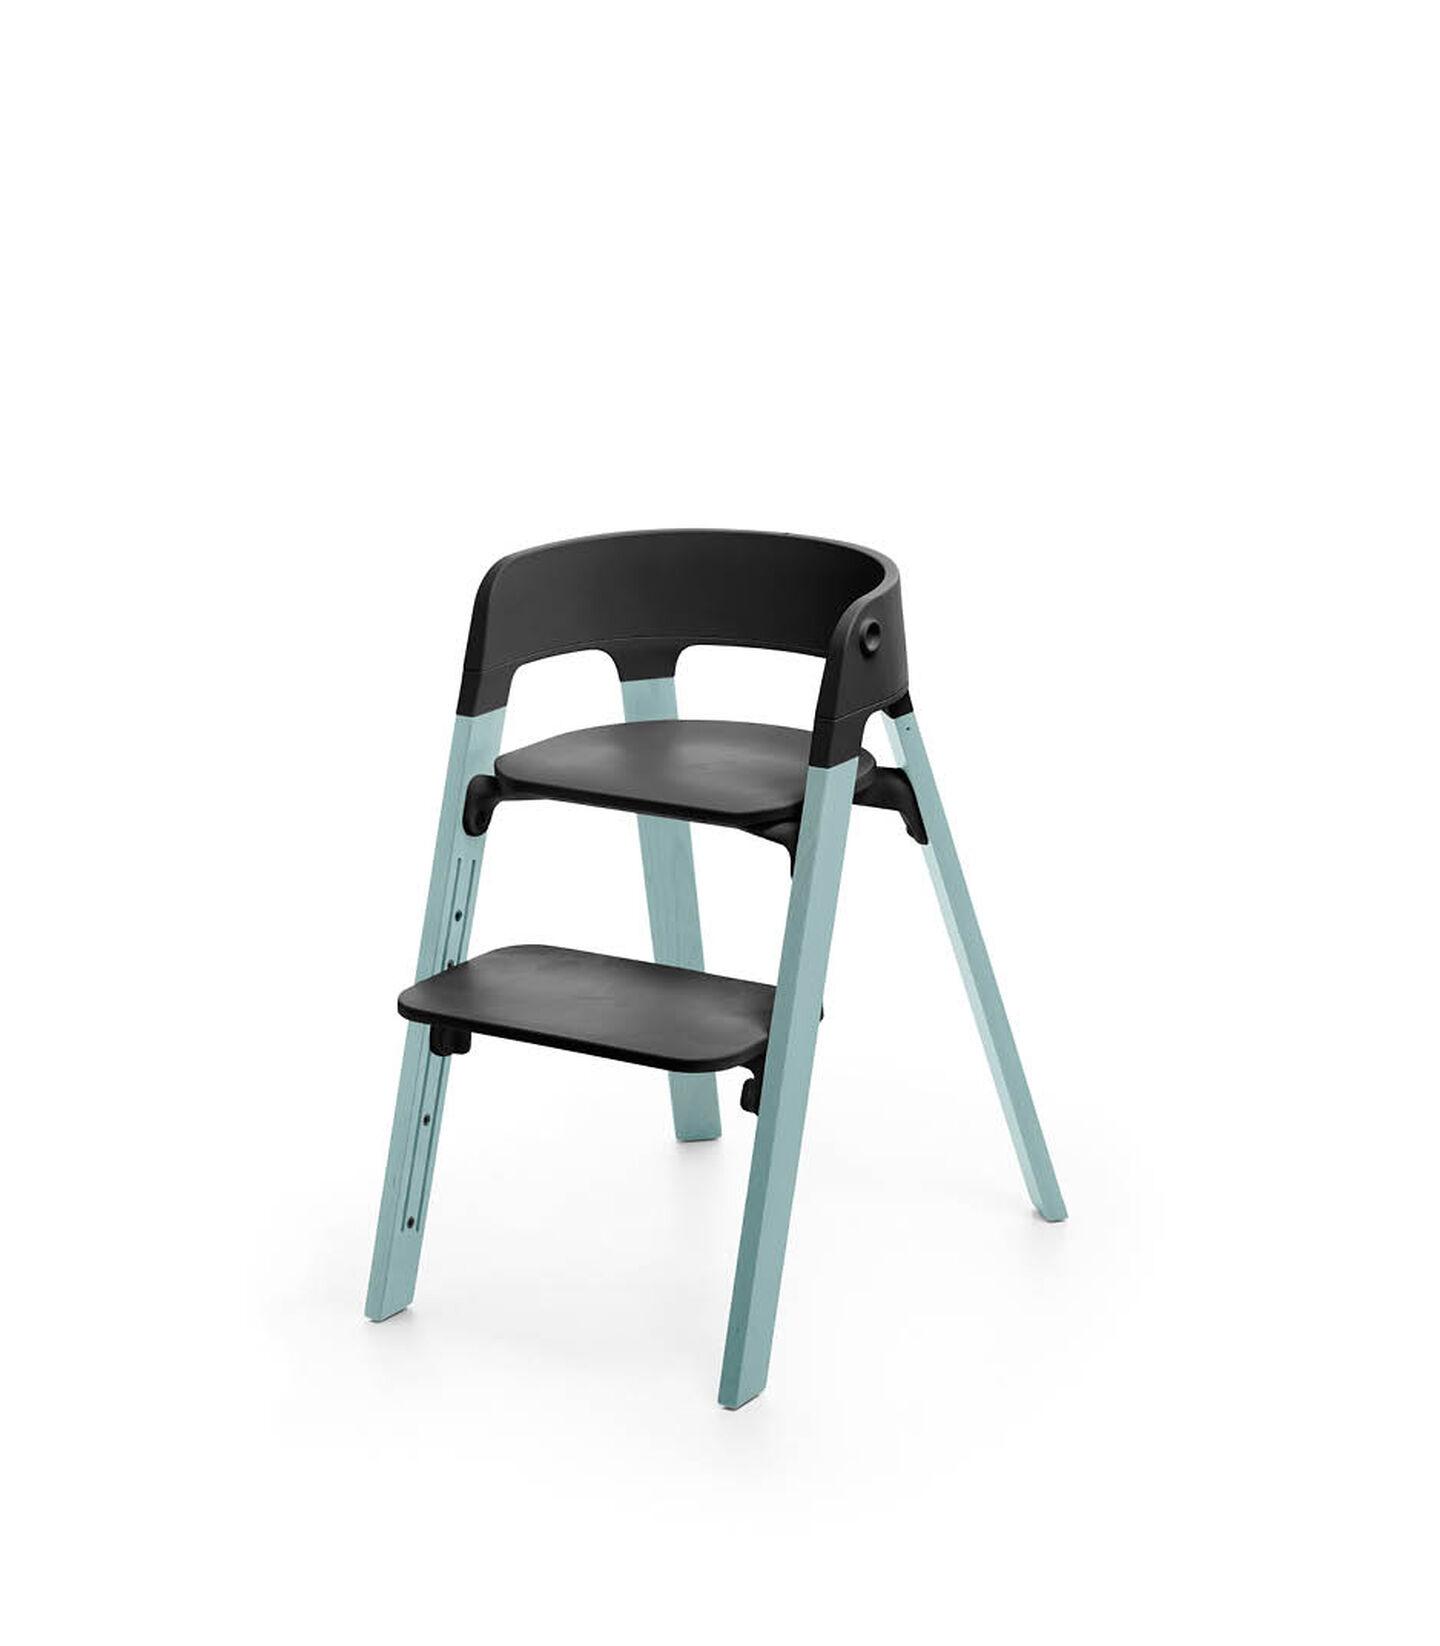 Stokke® Steps™ Chair Black Seat Aqua Blue Legs, Aqua Blue, mainview view 1